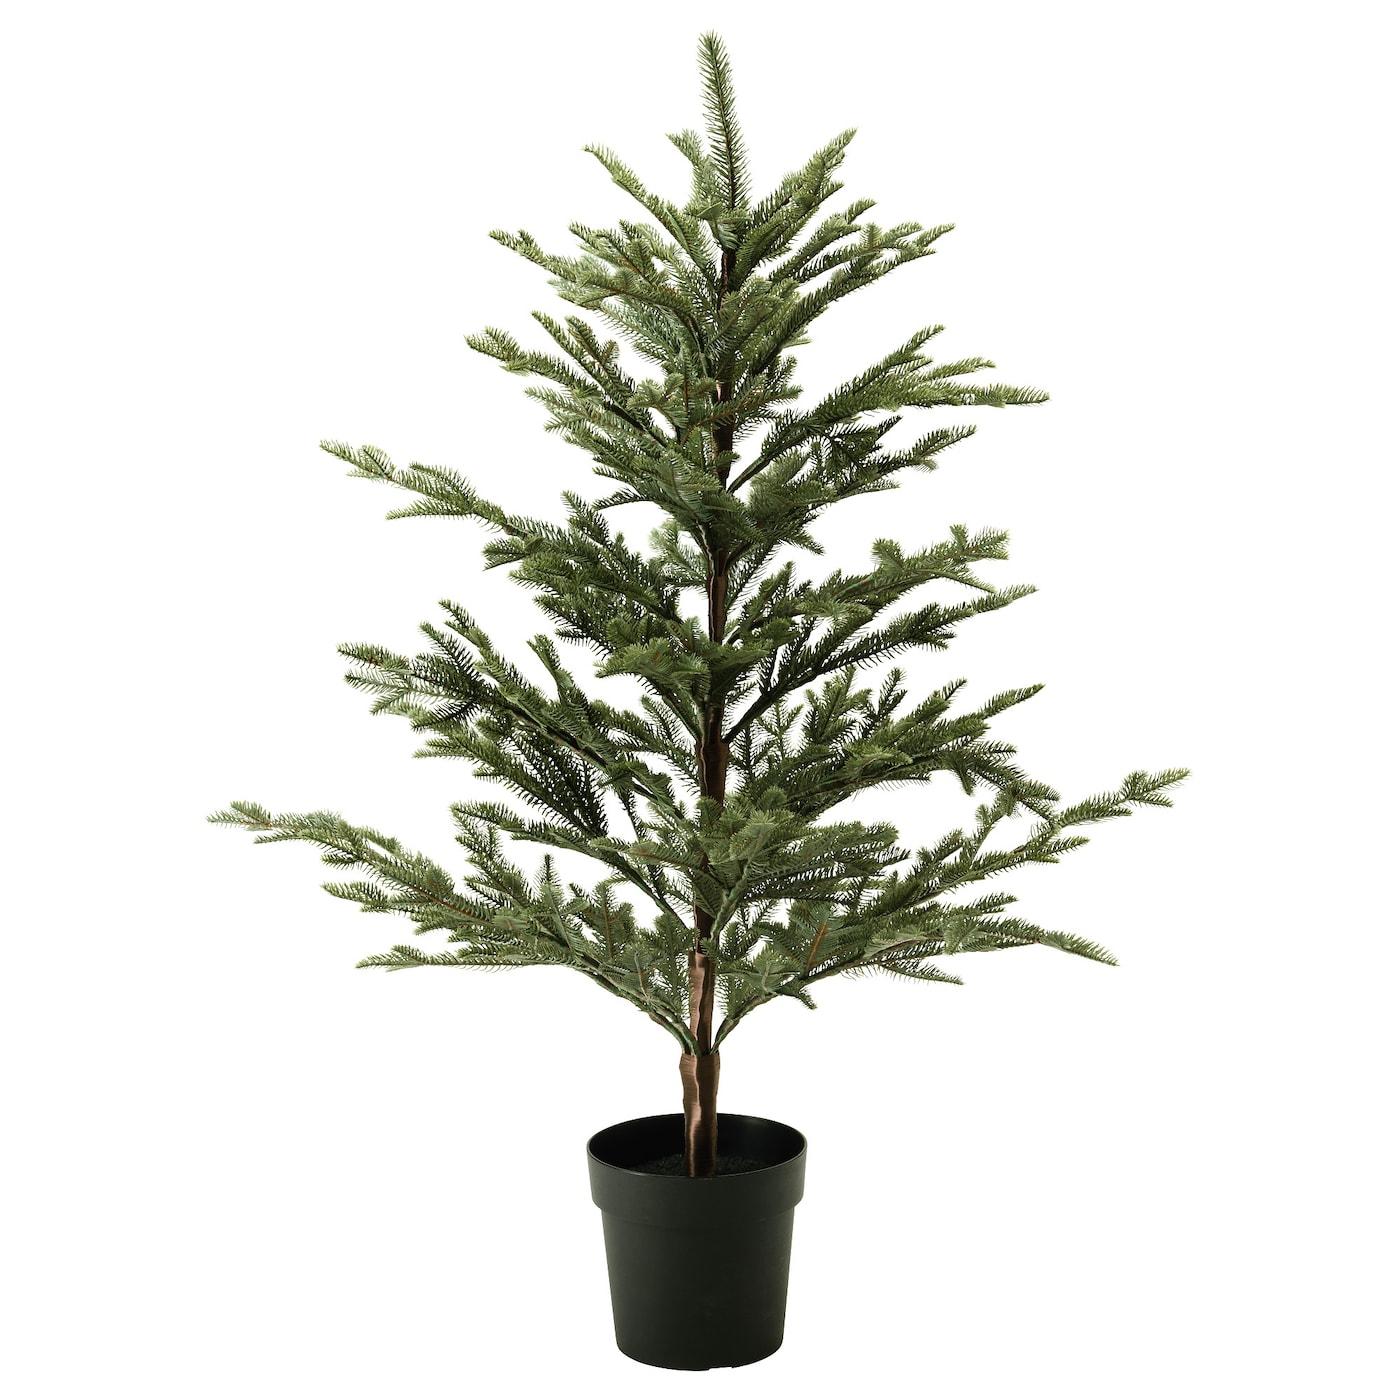 Fejka artificial potted plant christmas tree 21 cm ikea - Sapin de noel artificiel ikea ...